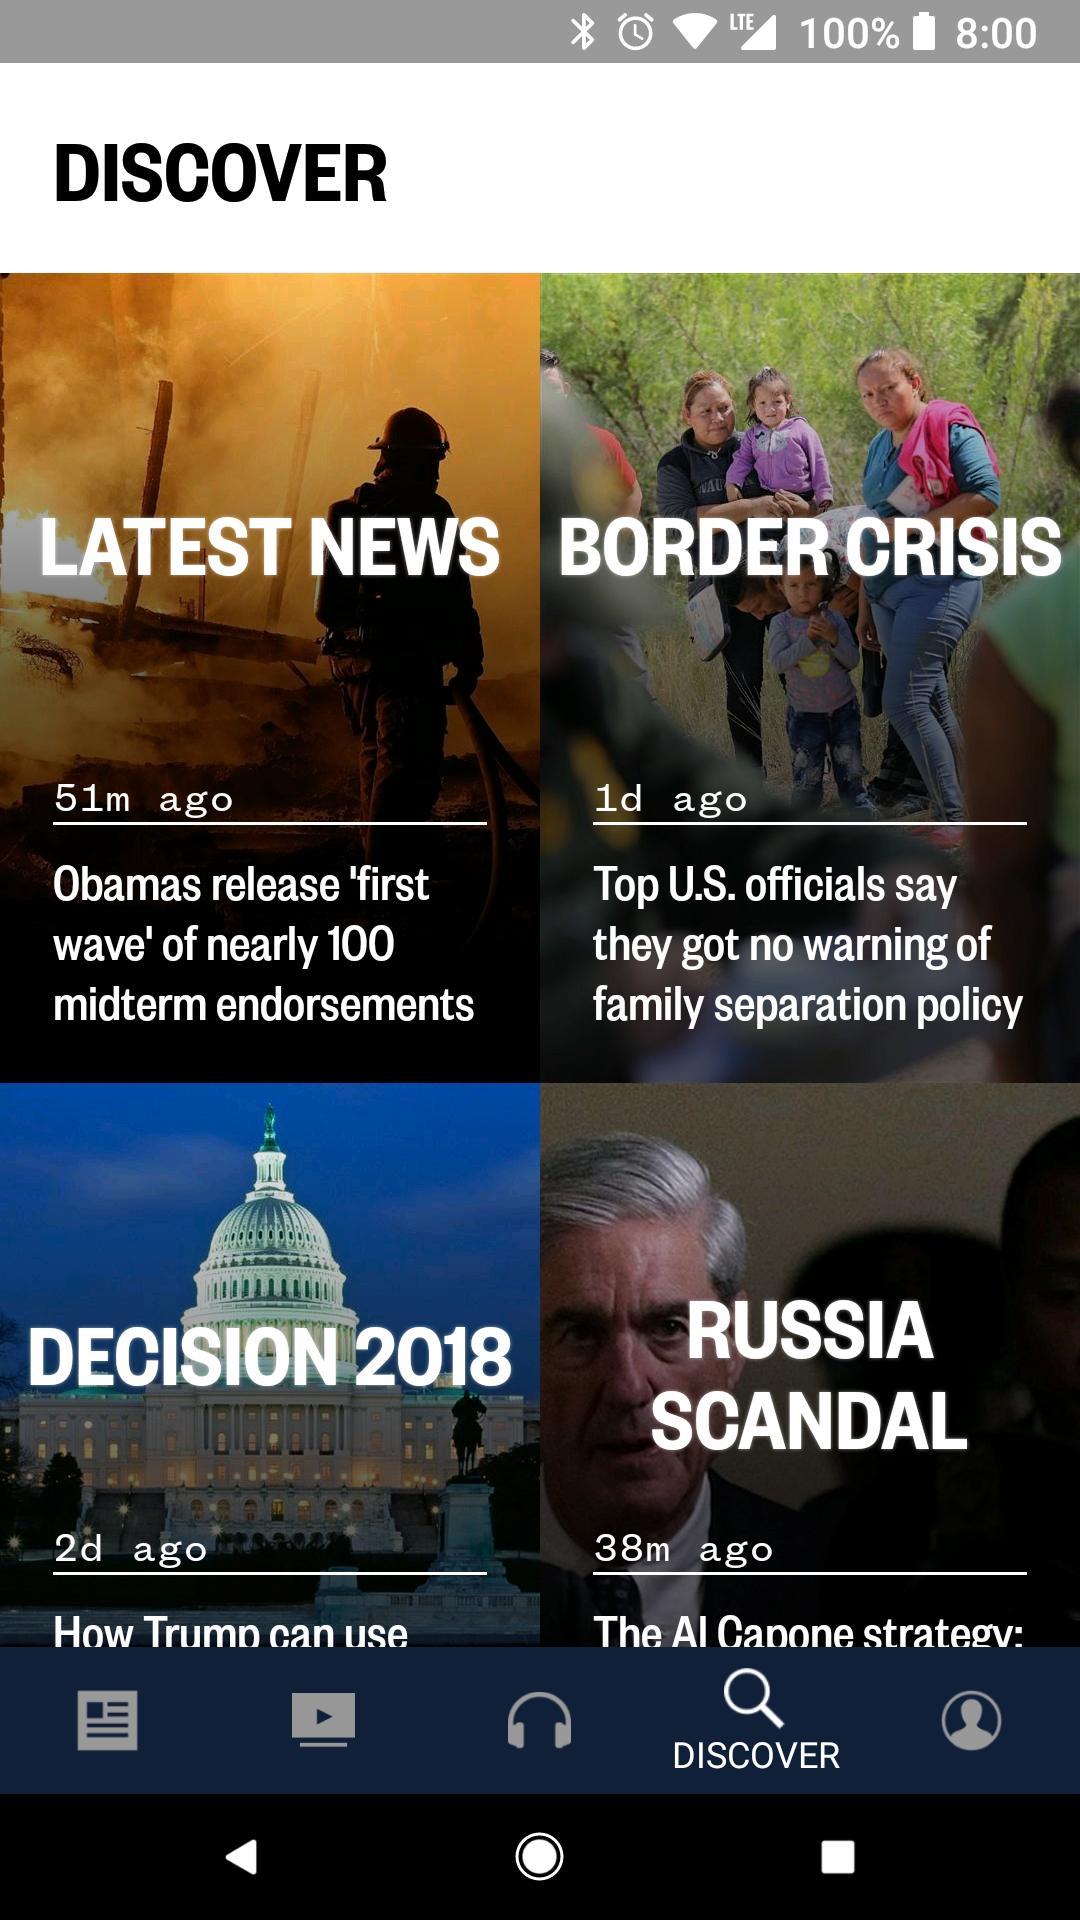 NBC News: Breaking News, US News & Live Video 6.0.11 Screenshot 4